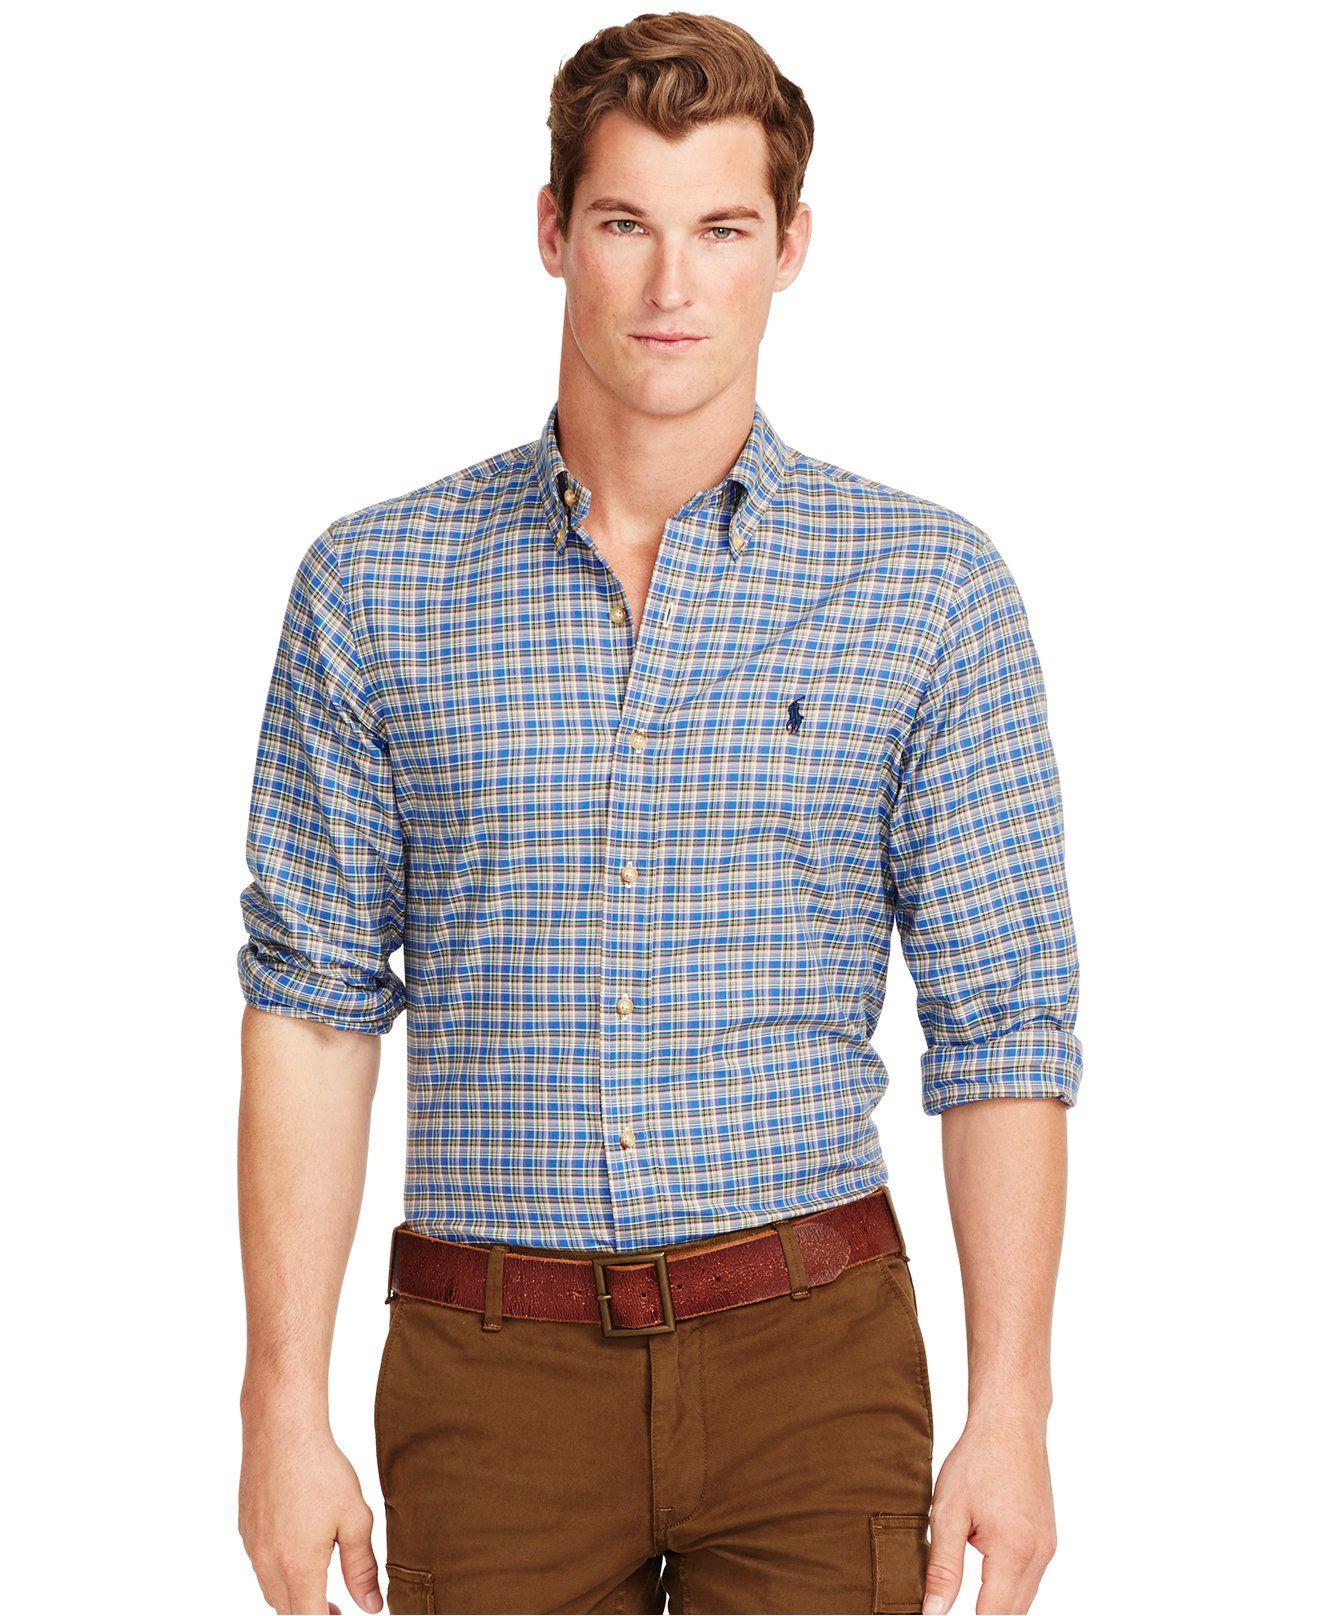 54361347d Polo Ralph Lauren Plaid Twill Shirt - Casual Button-Down Shirts - Men -  Macy s